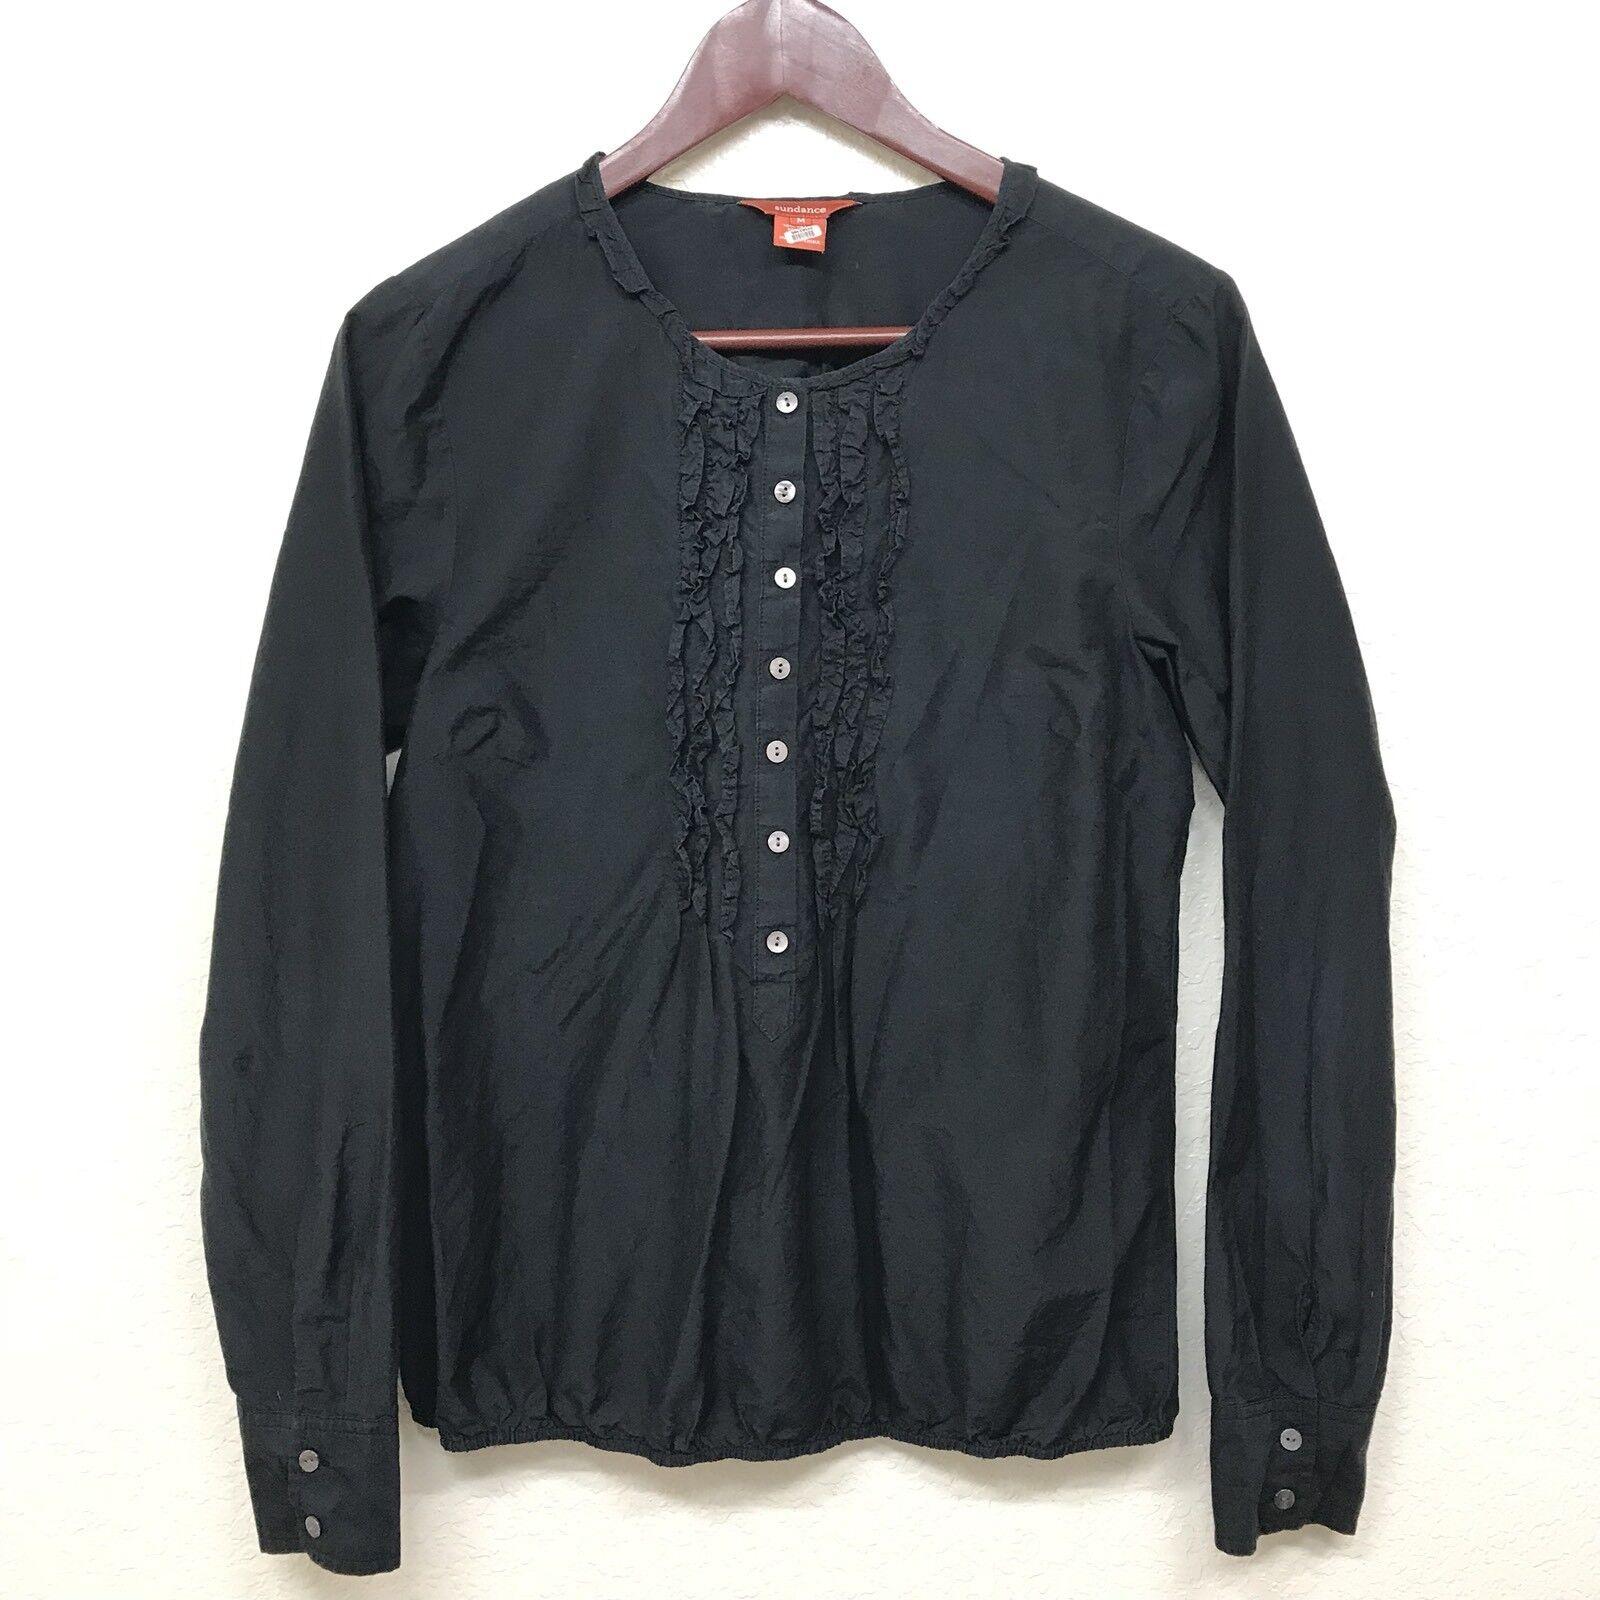 Sundnace Catalog Womens Navy bluee 1 2 Button Ruffle Long Sleeve Blouse Sz Medium